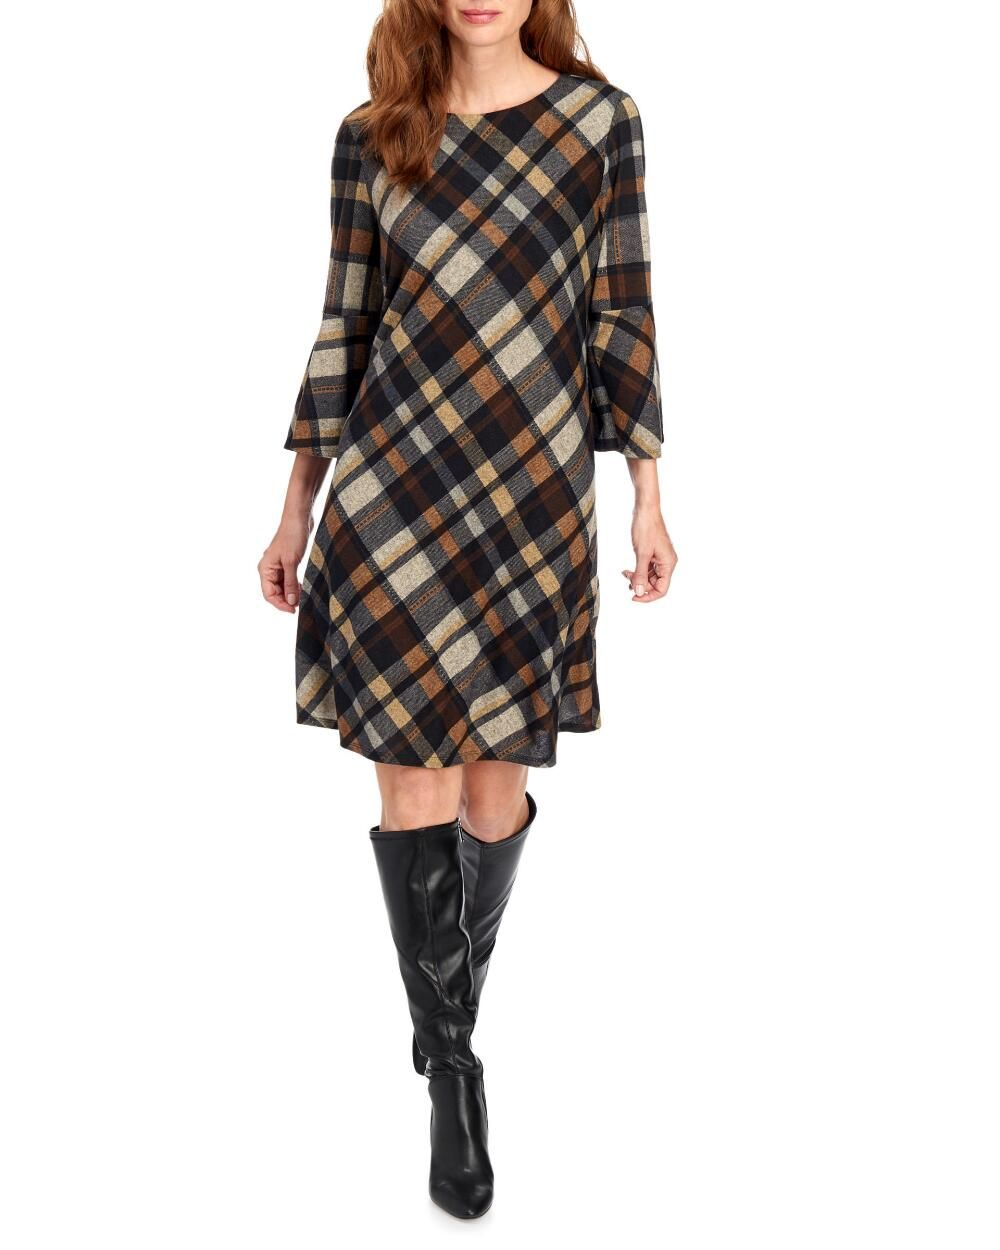 Pin By Allison Scarpone On B A C K T O S C H O O L Plaid Dress Fall Long Sleeve Sweater Dress Long Sleeve Tee Dress [ 1250 x 1000 Pixel ]